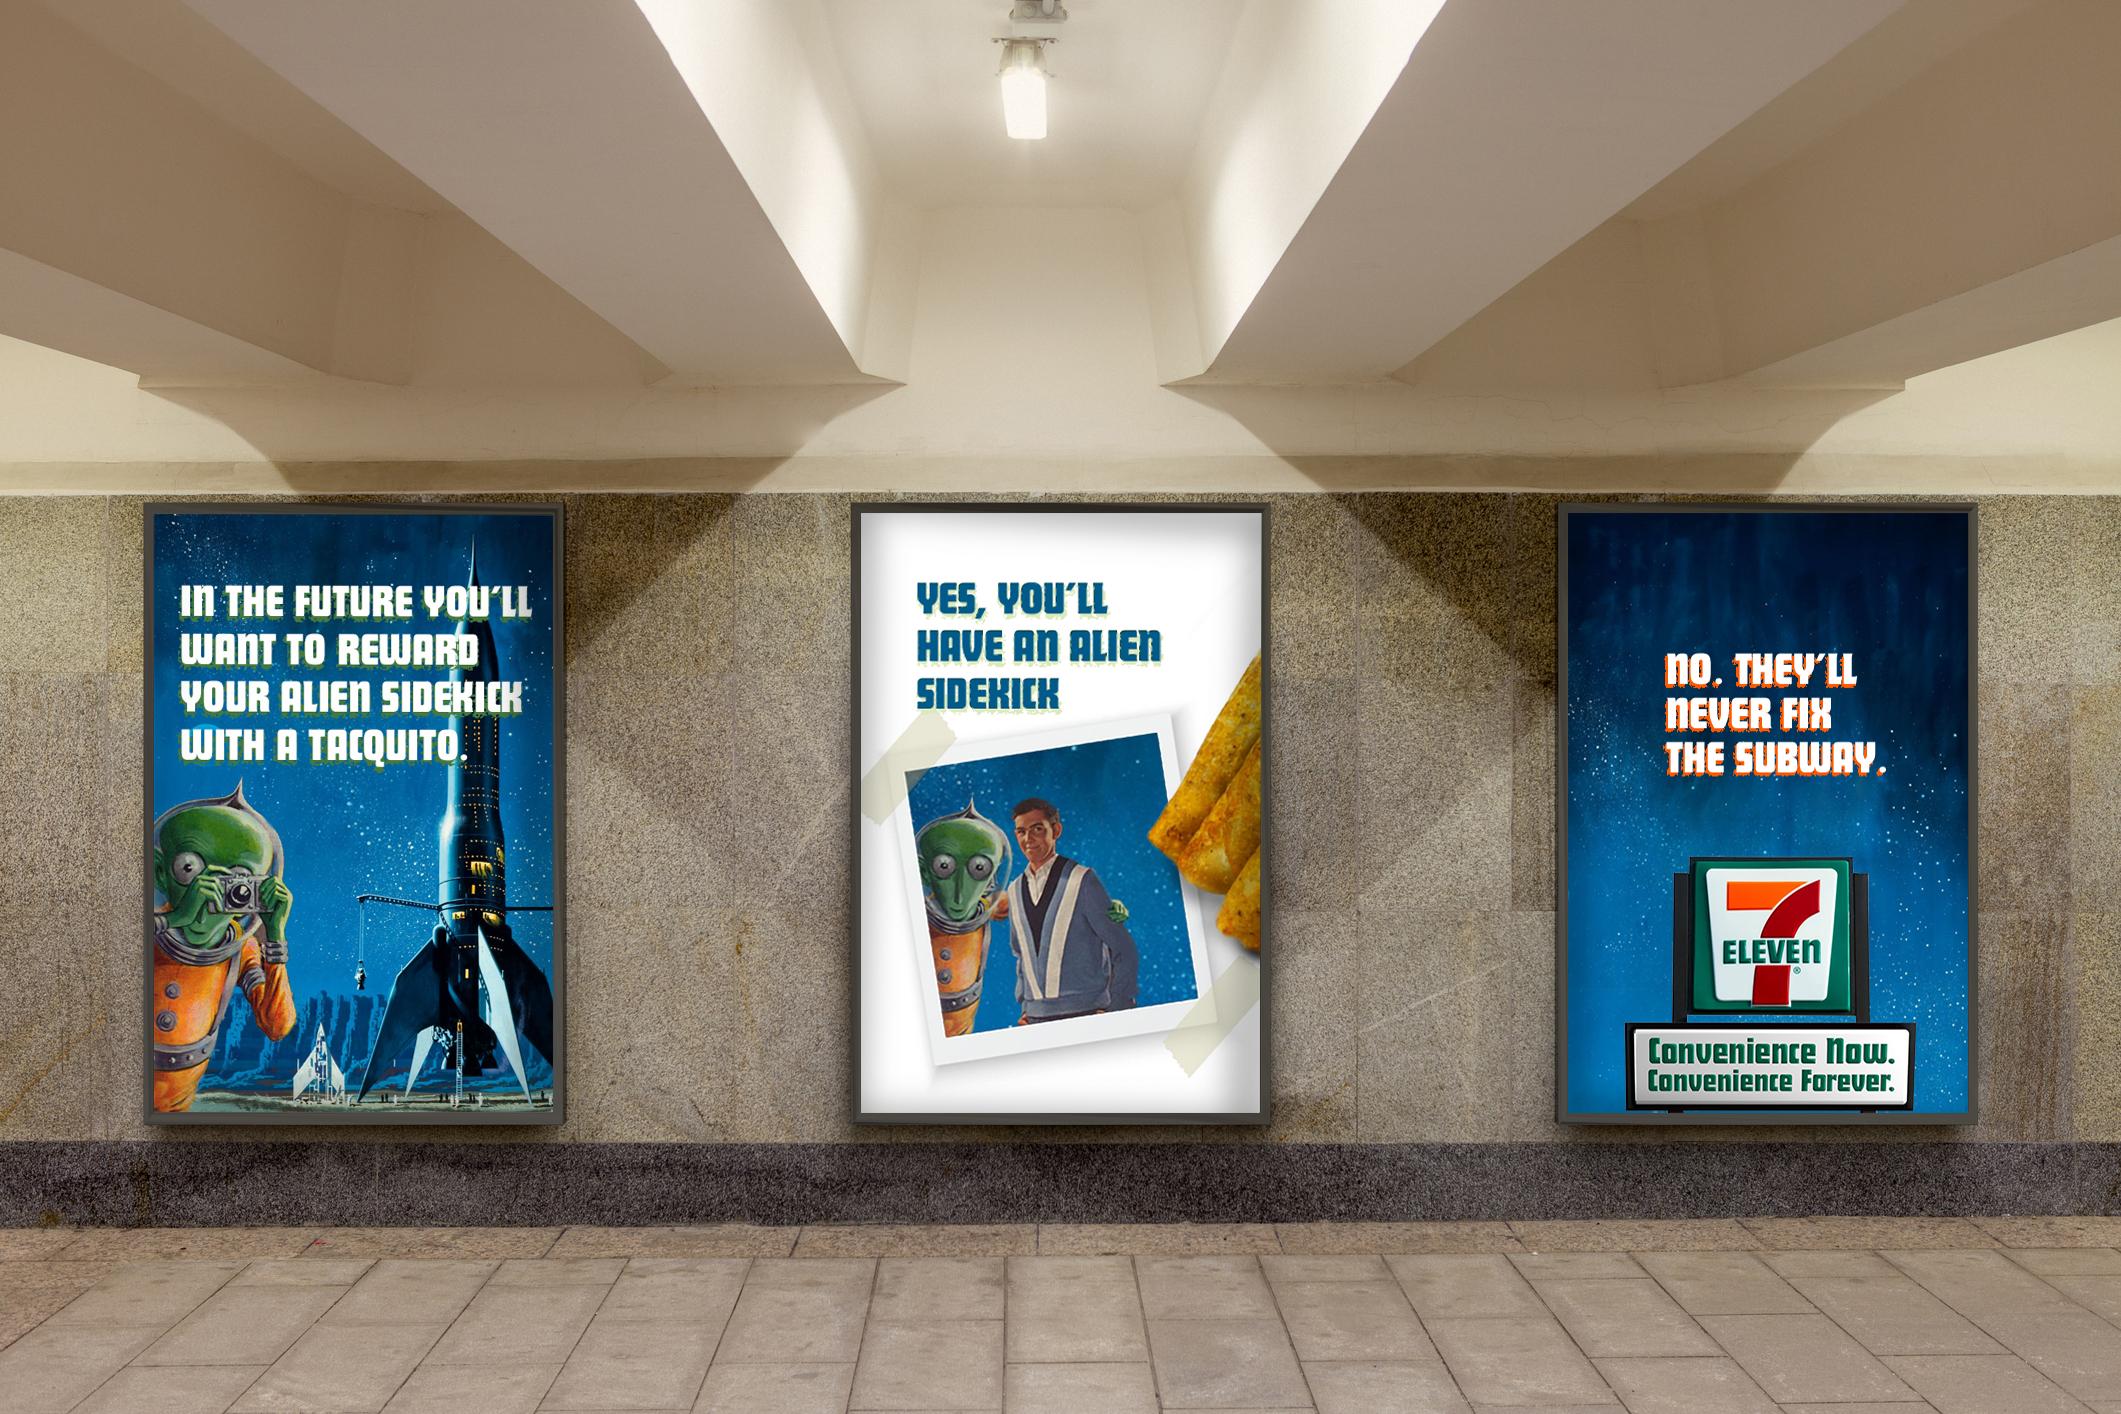 subway redo copy.jpg